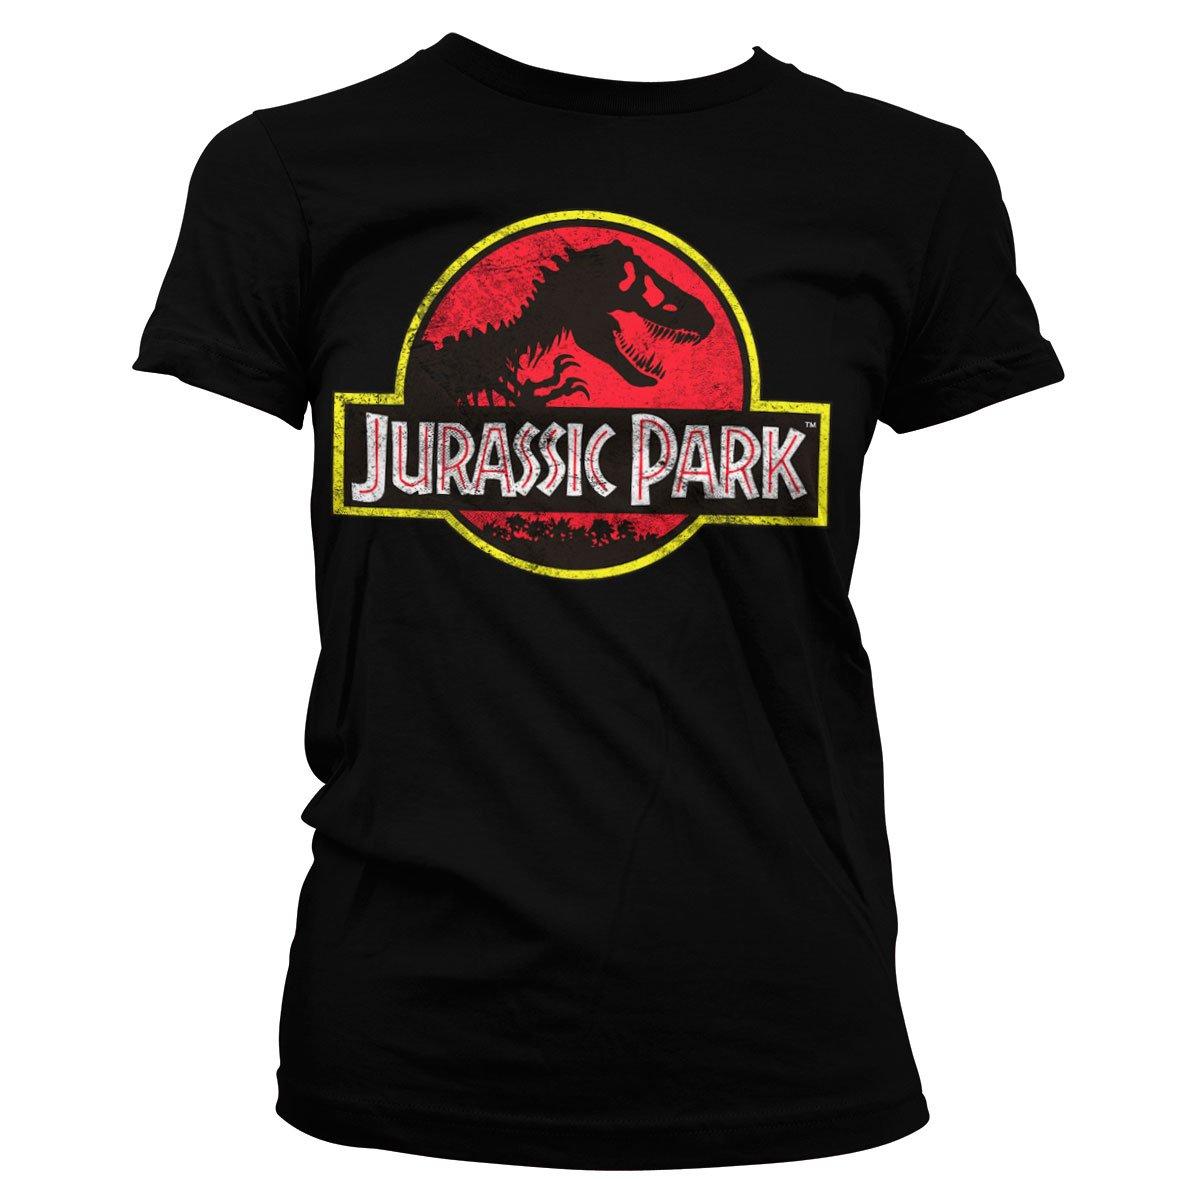 Oficialmente Licenciado Jurassic Park Distressed Logo Mujer Camiseta